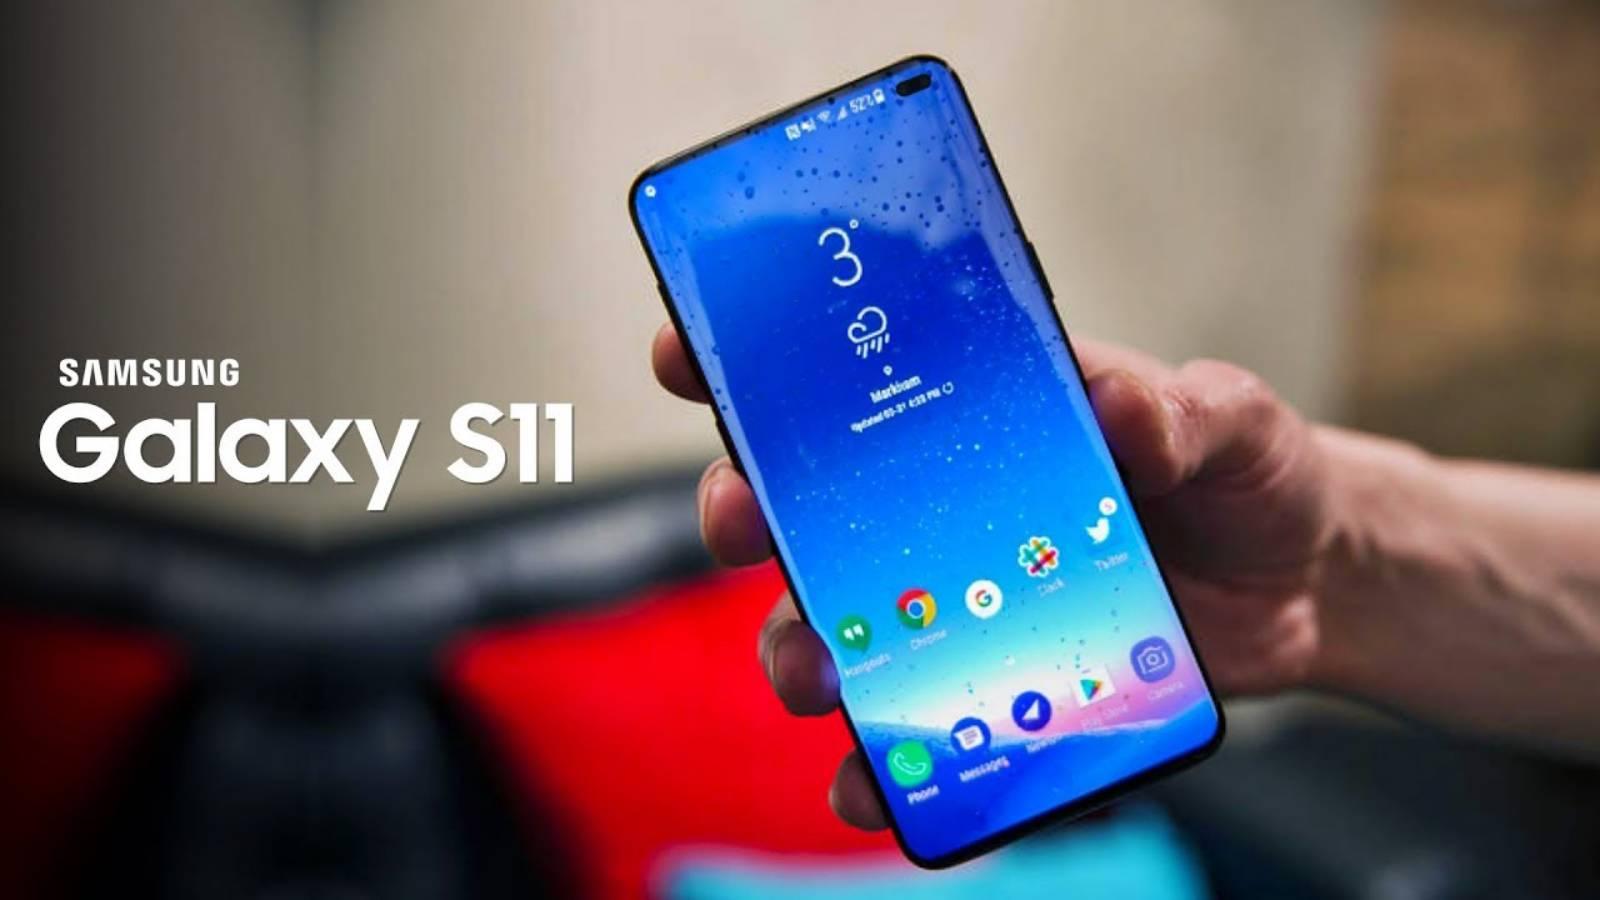 Samsung GALAXY S11 amd